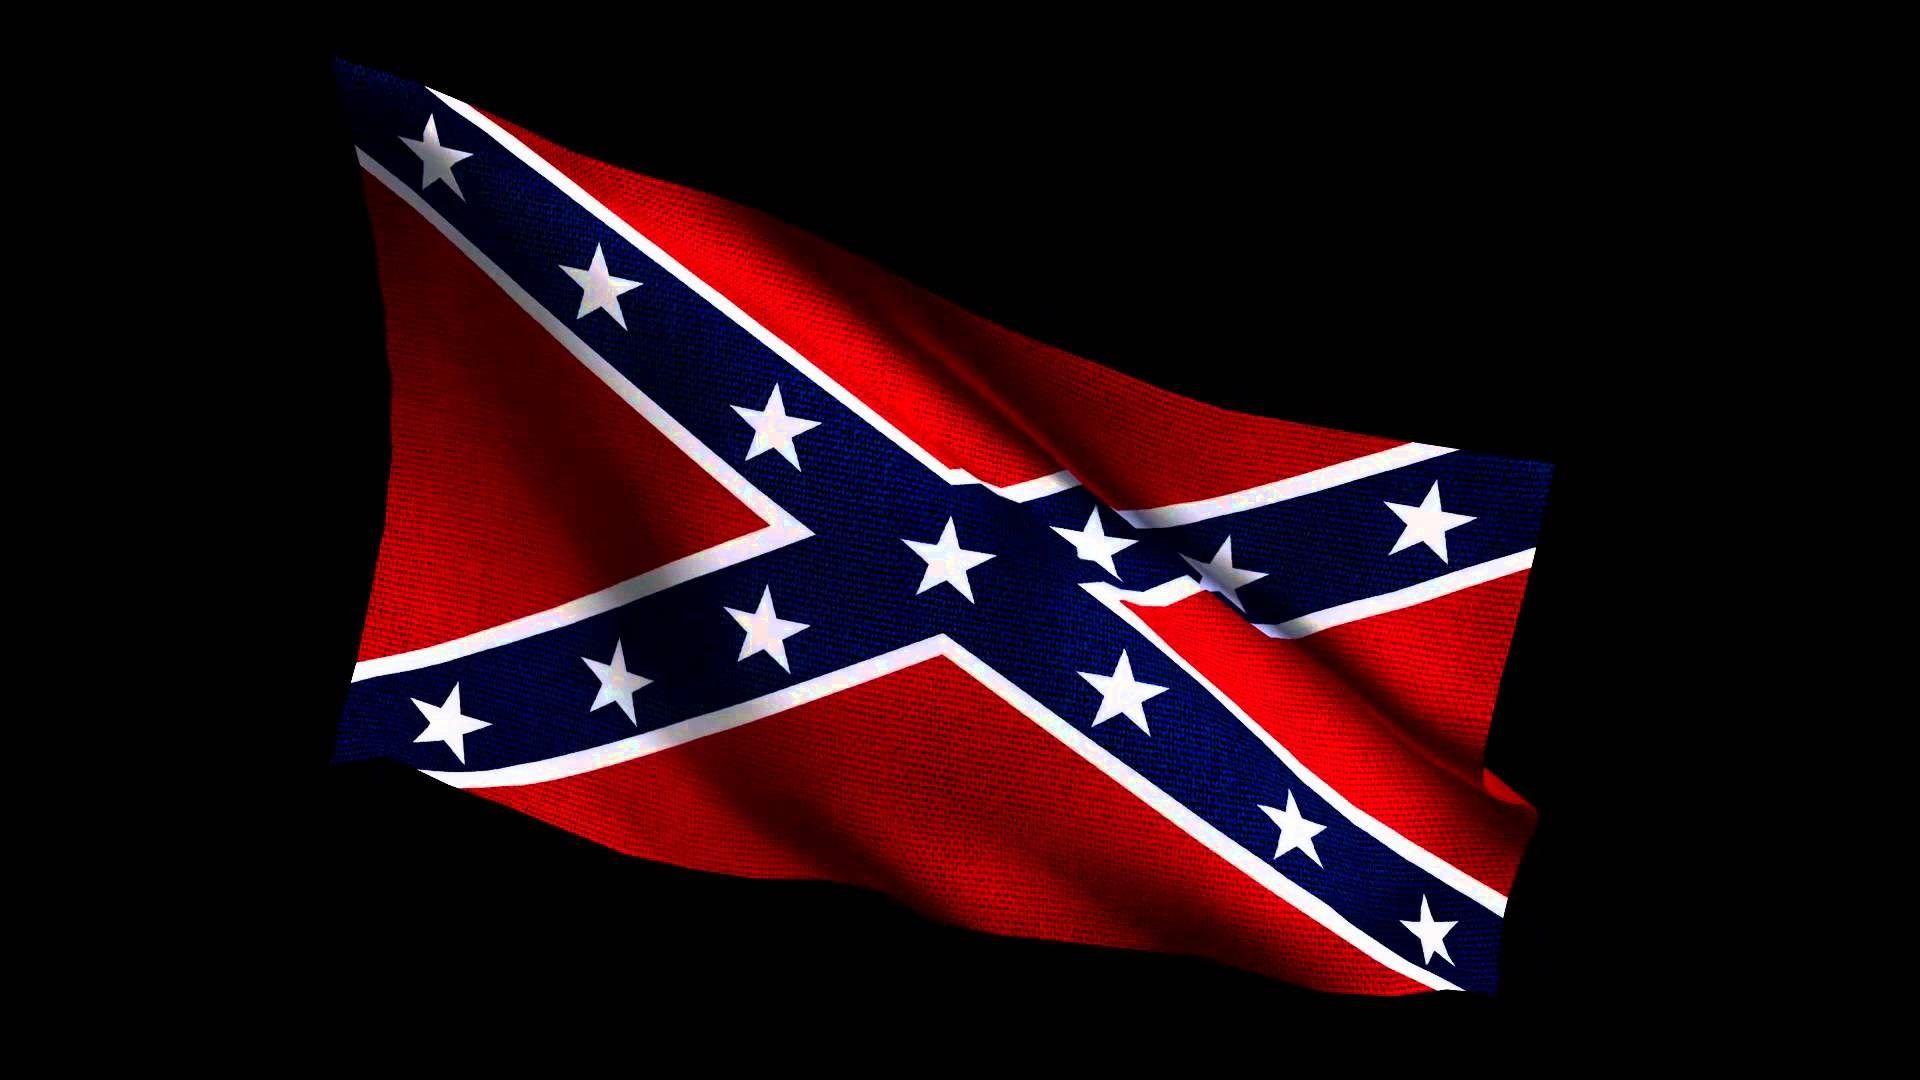 Confederate Flag Wallpaper Desktop Backgrounds Free